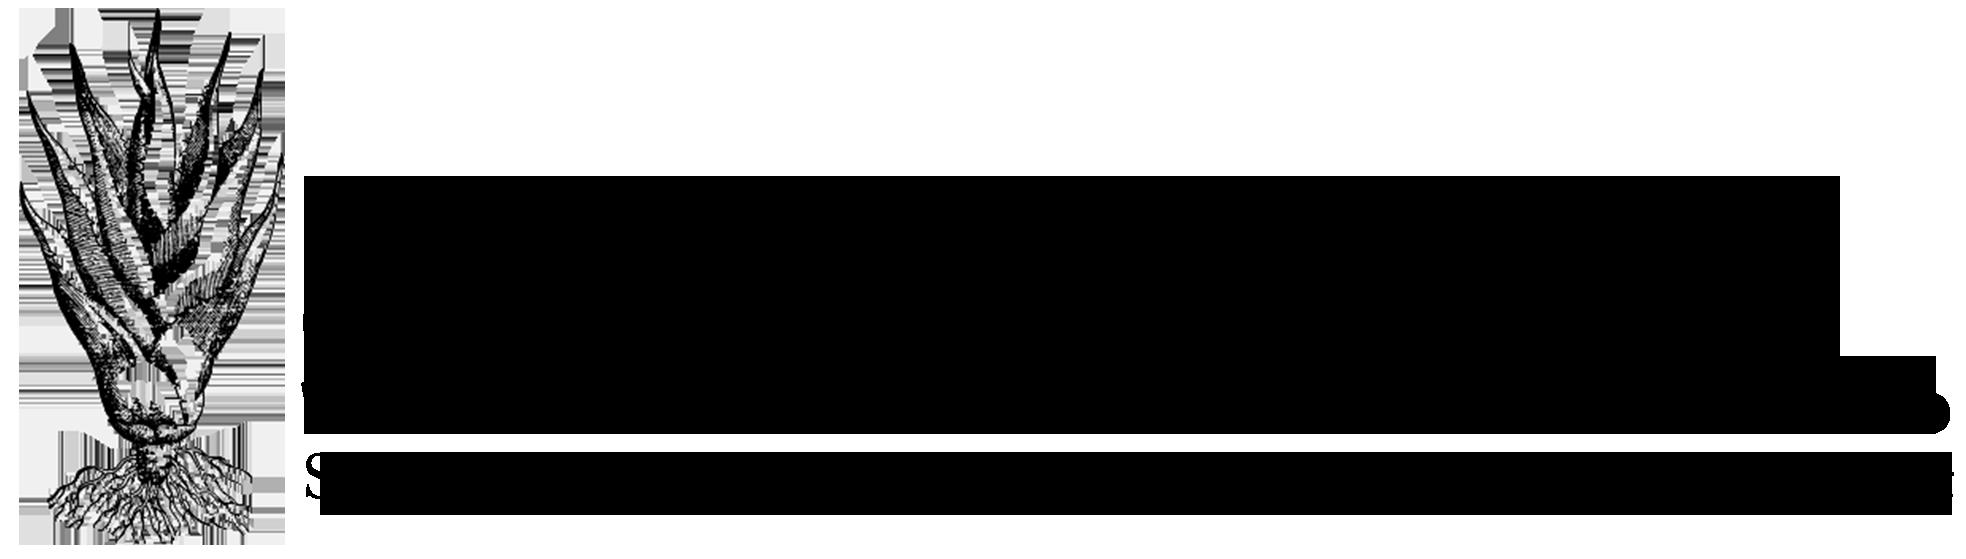 sacred_logo.png